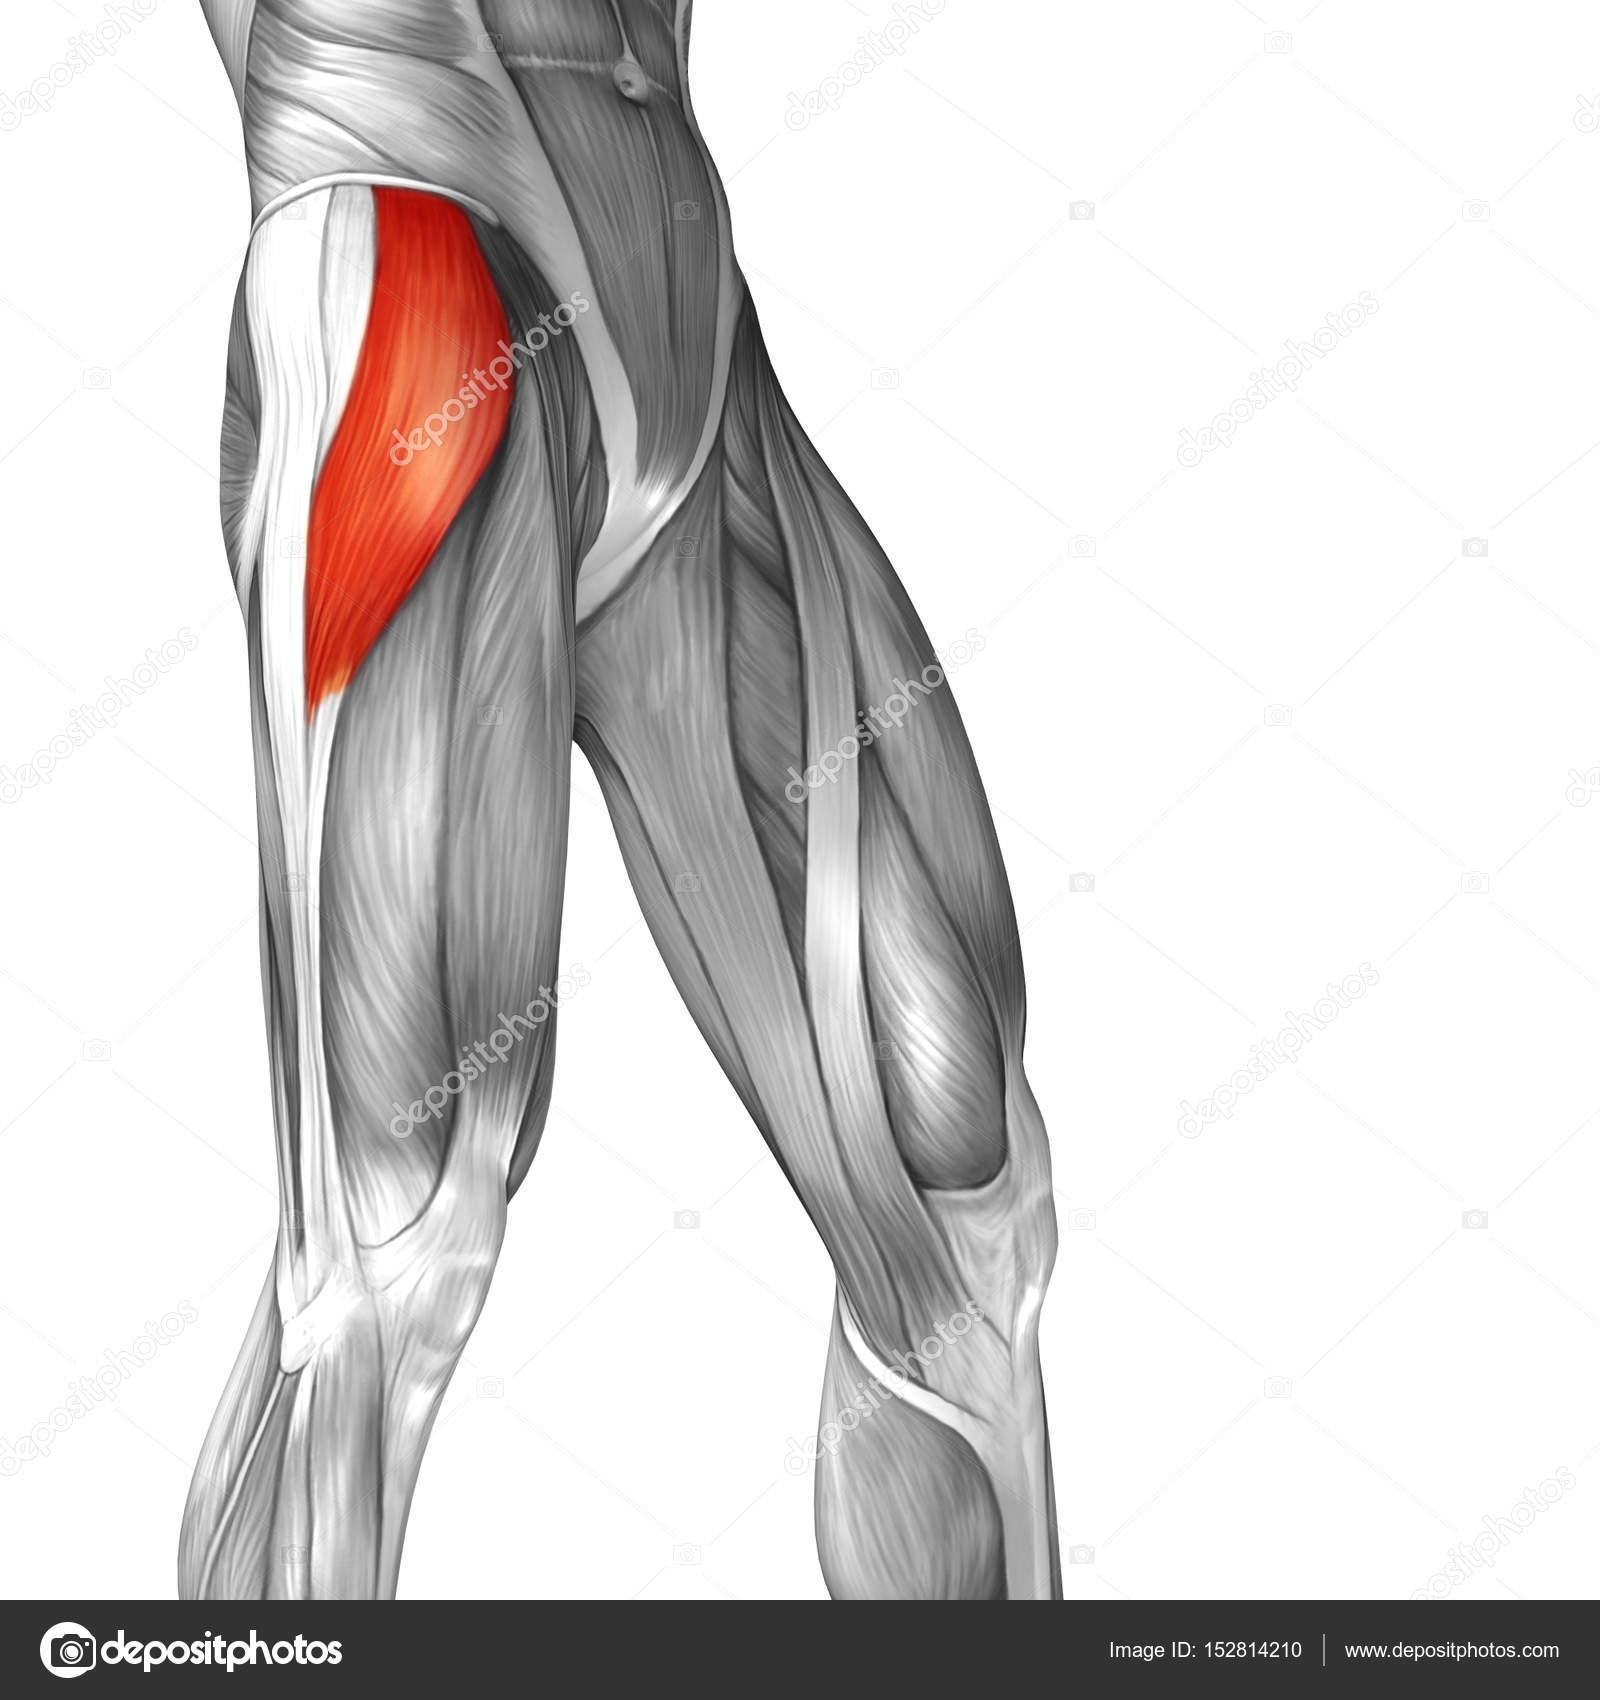 human upper legs anatomy — Stock Photo © design36 #152814210